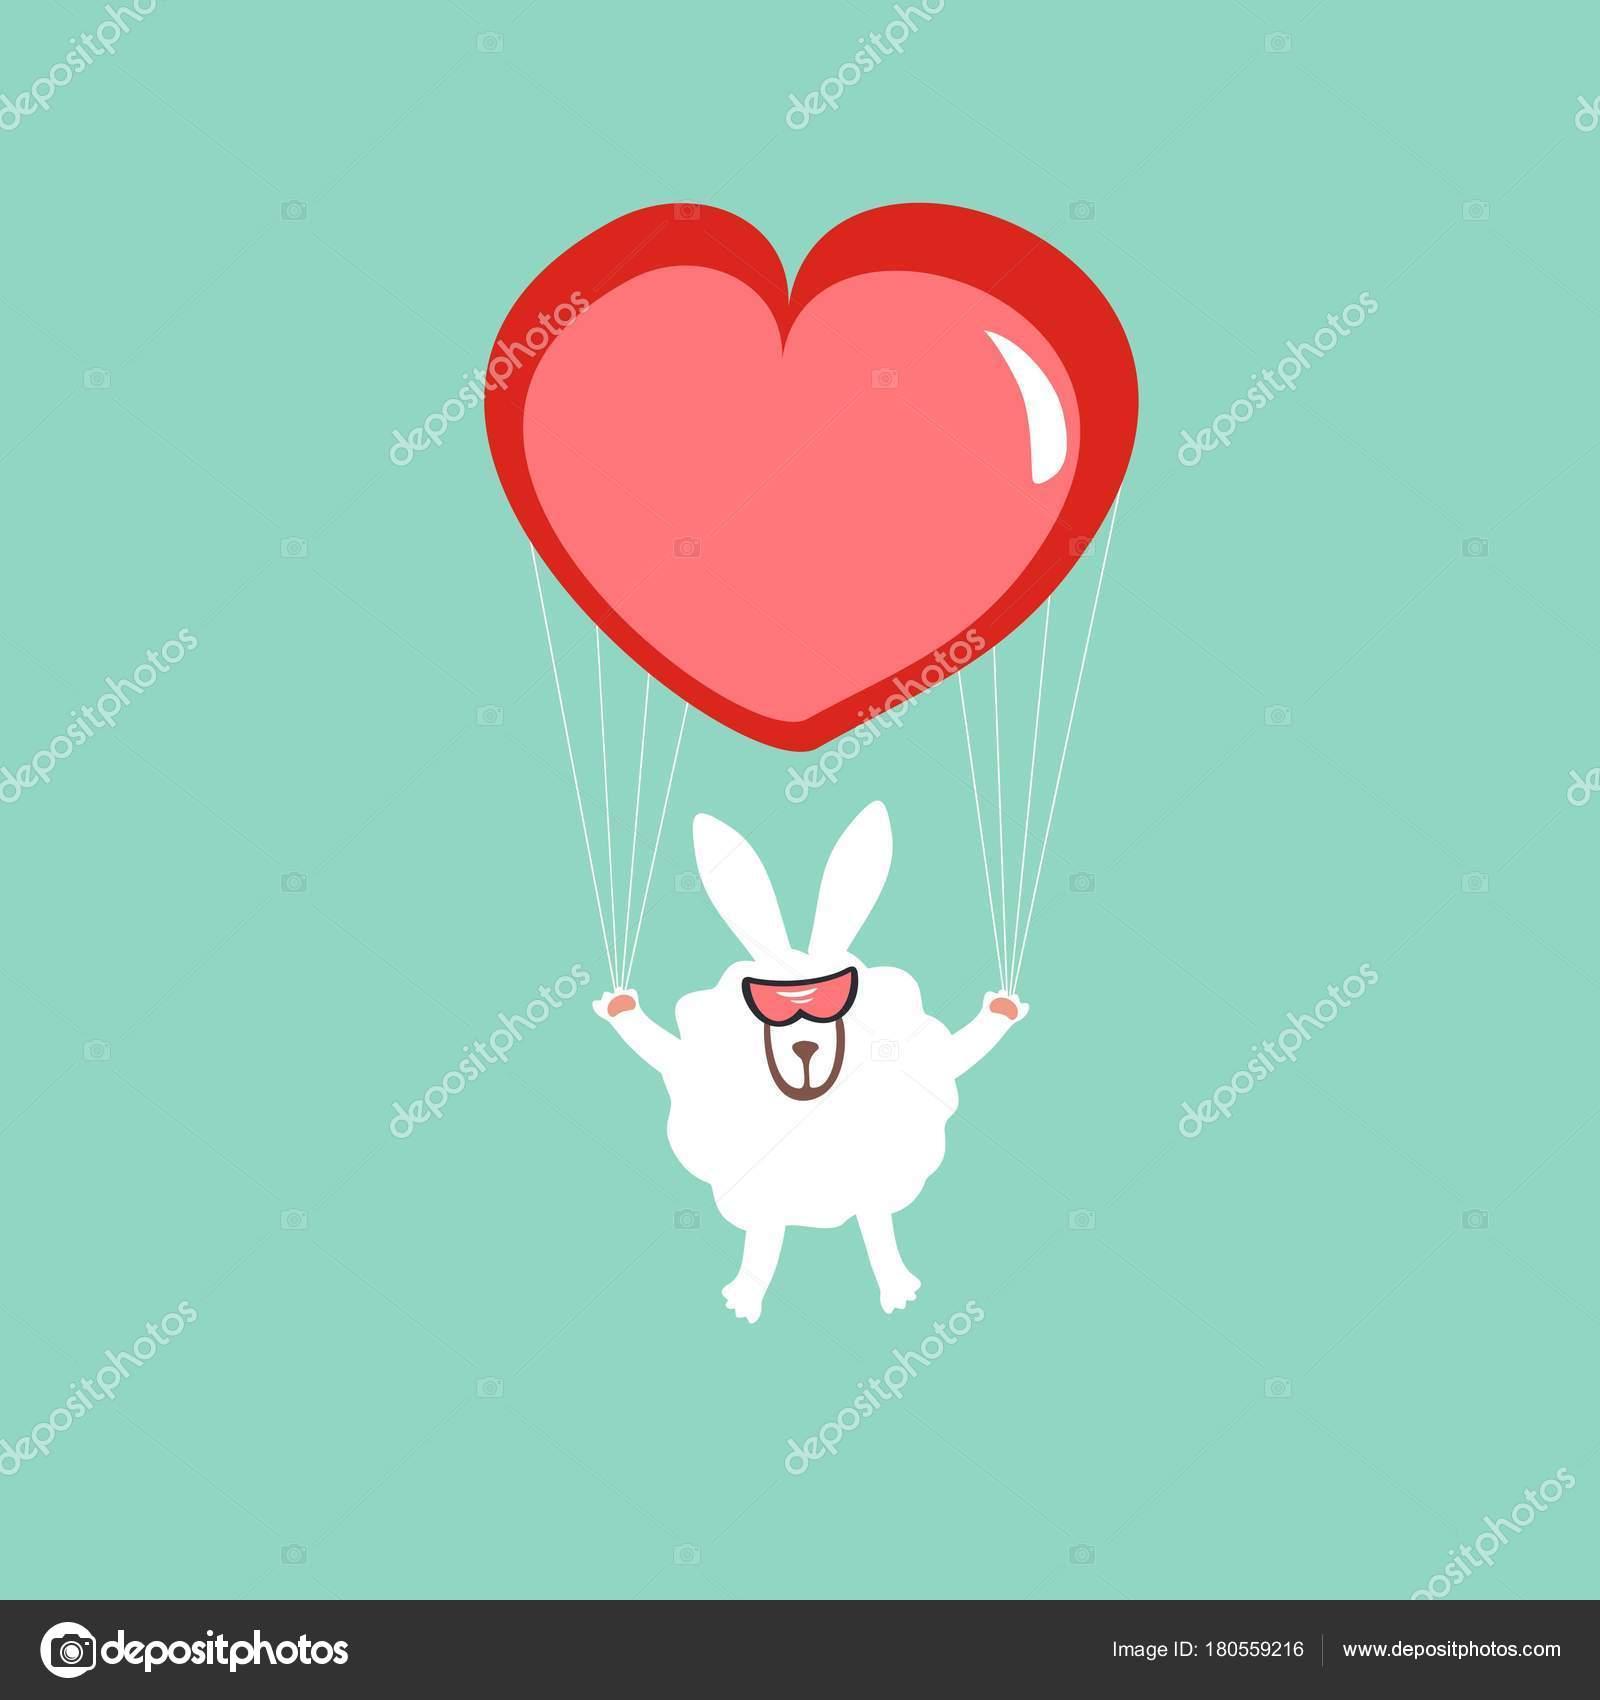 Rabbit Heart Form Parachute Greeting Card Valentine Day Love